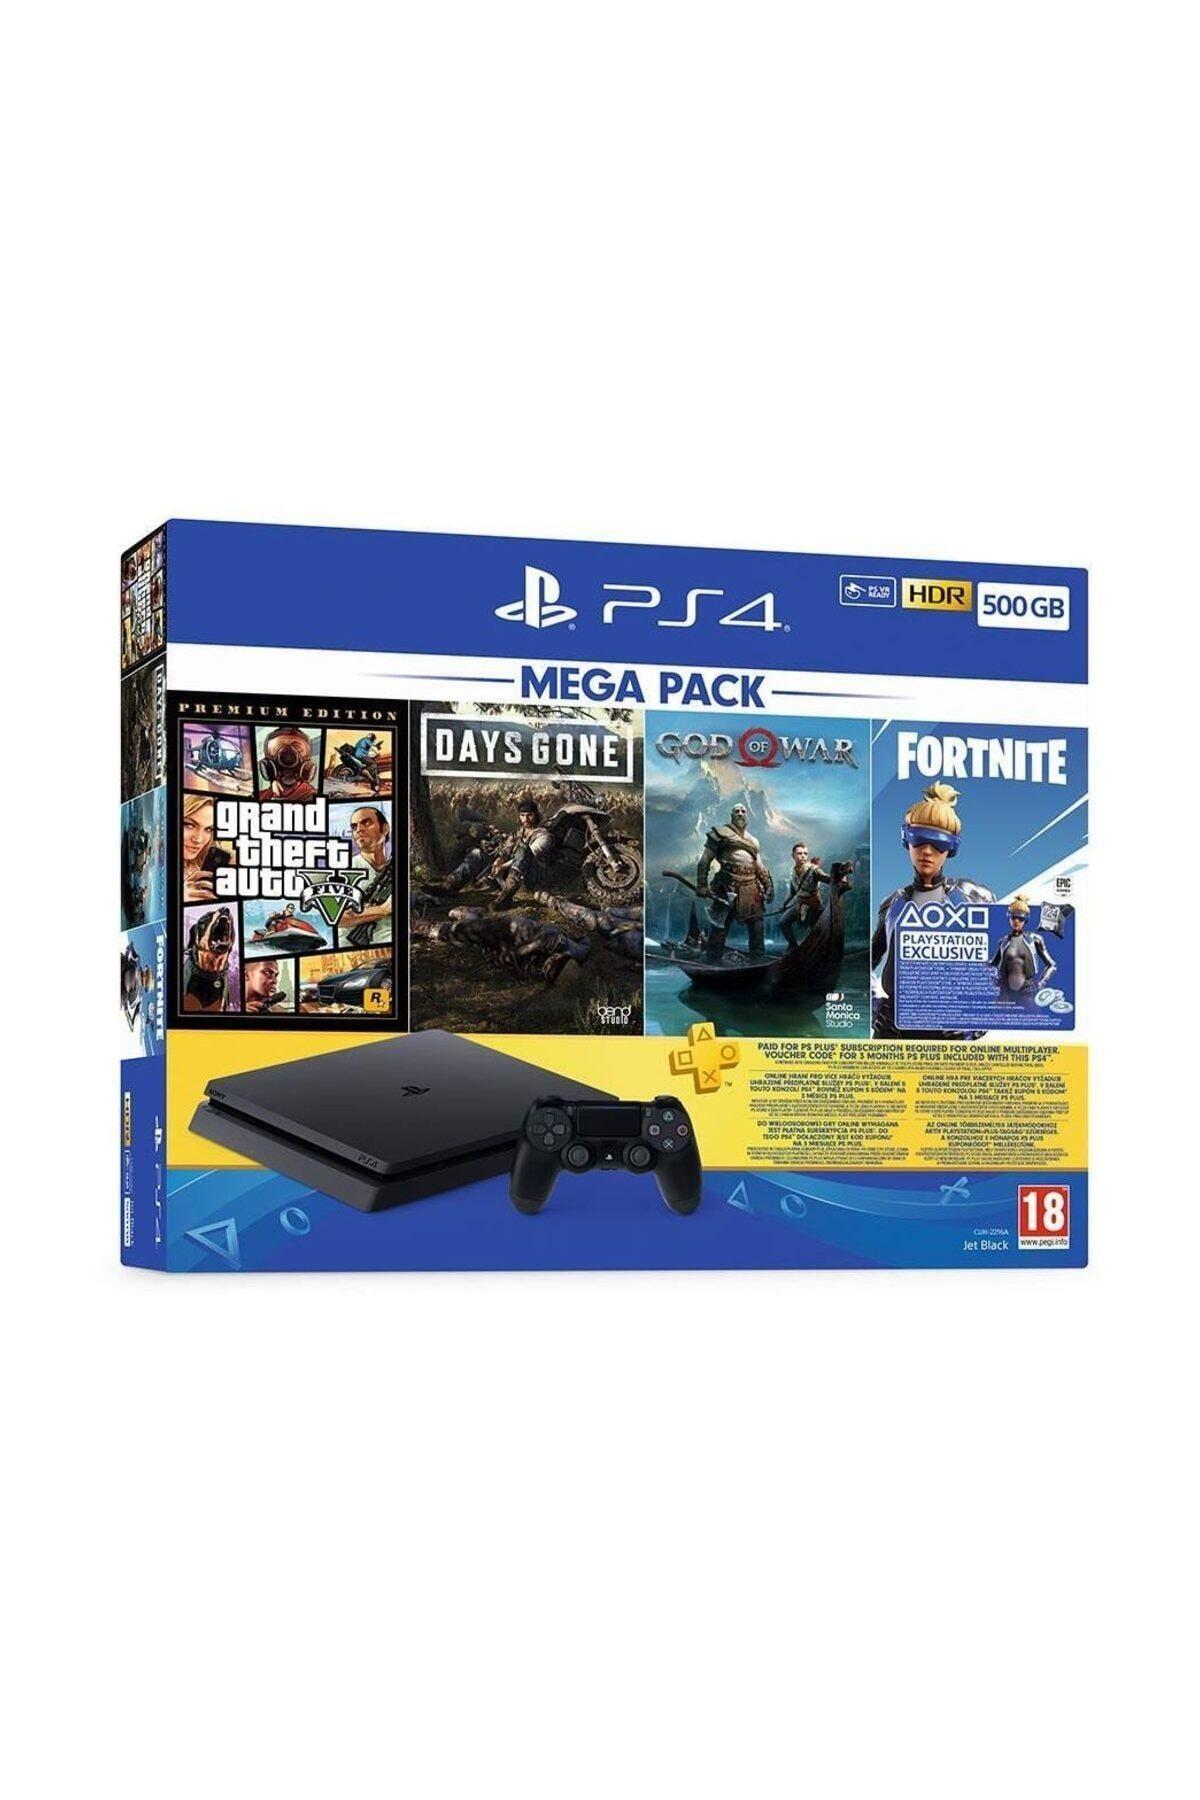 Sony Playstation 4 Slim 500 Gb + Gta V + Days Gone + God Of War + Fortnite + Psn (Eurasia Garantili) 1